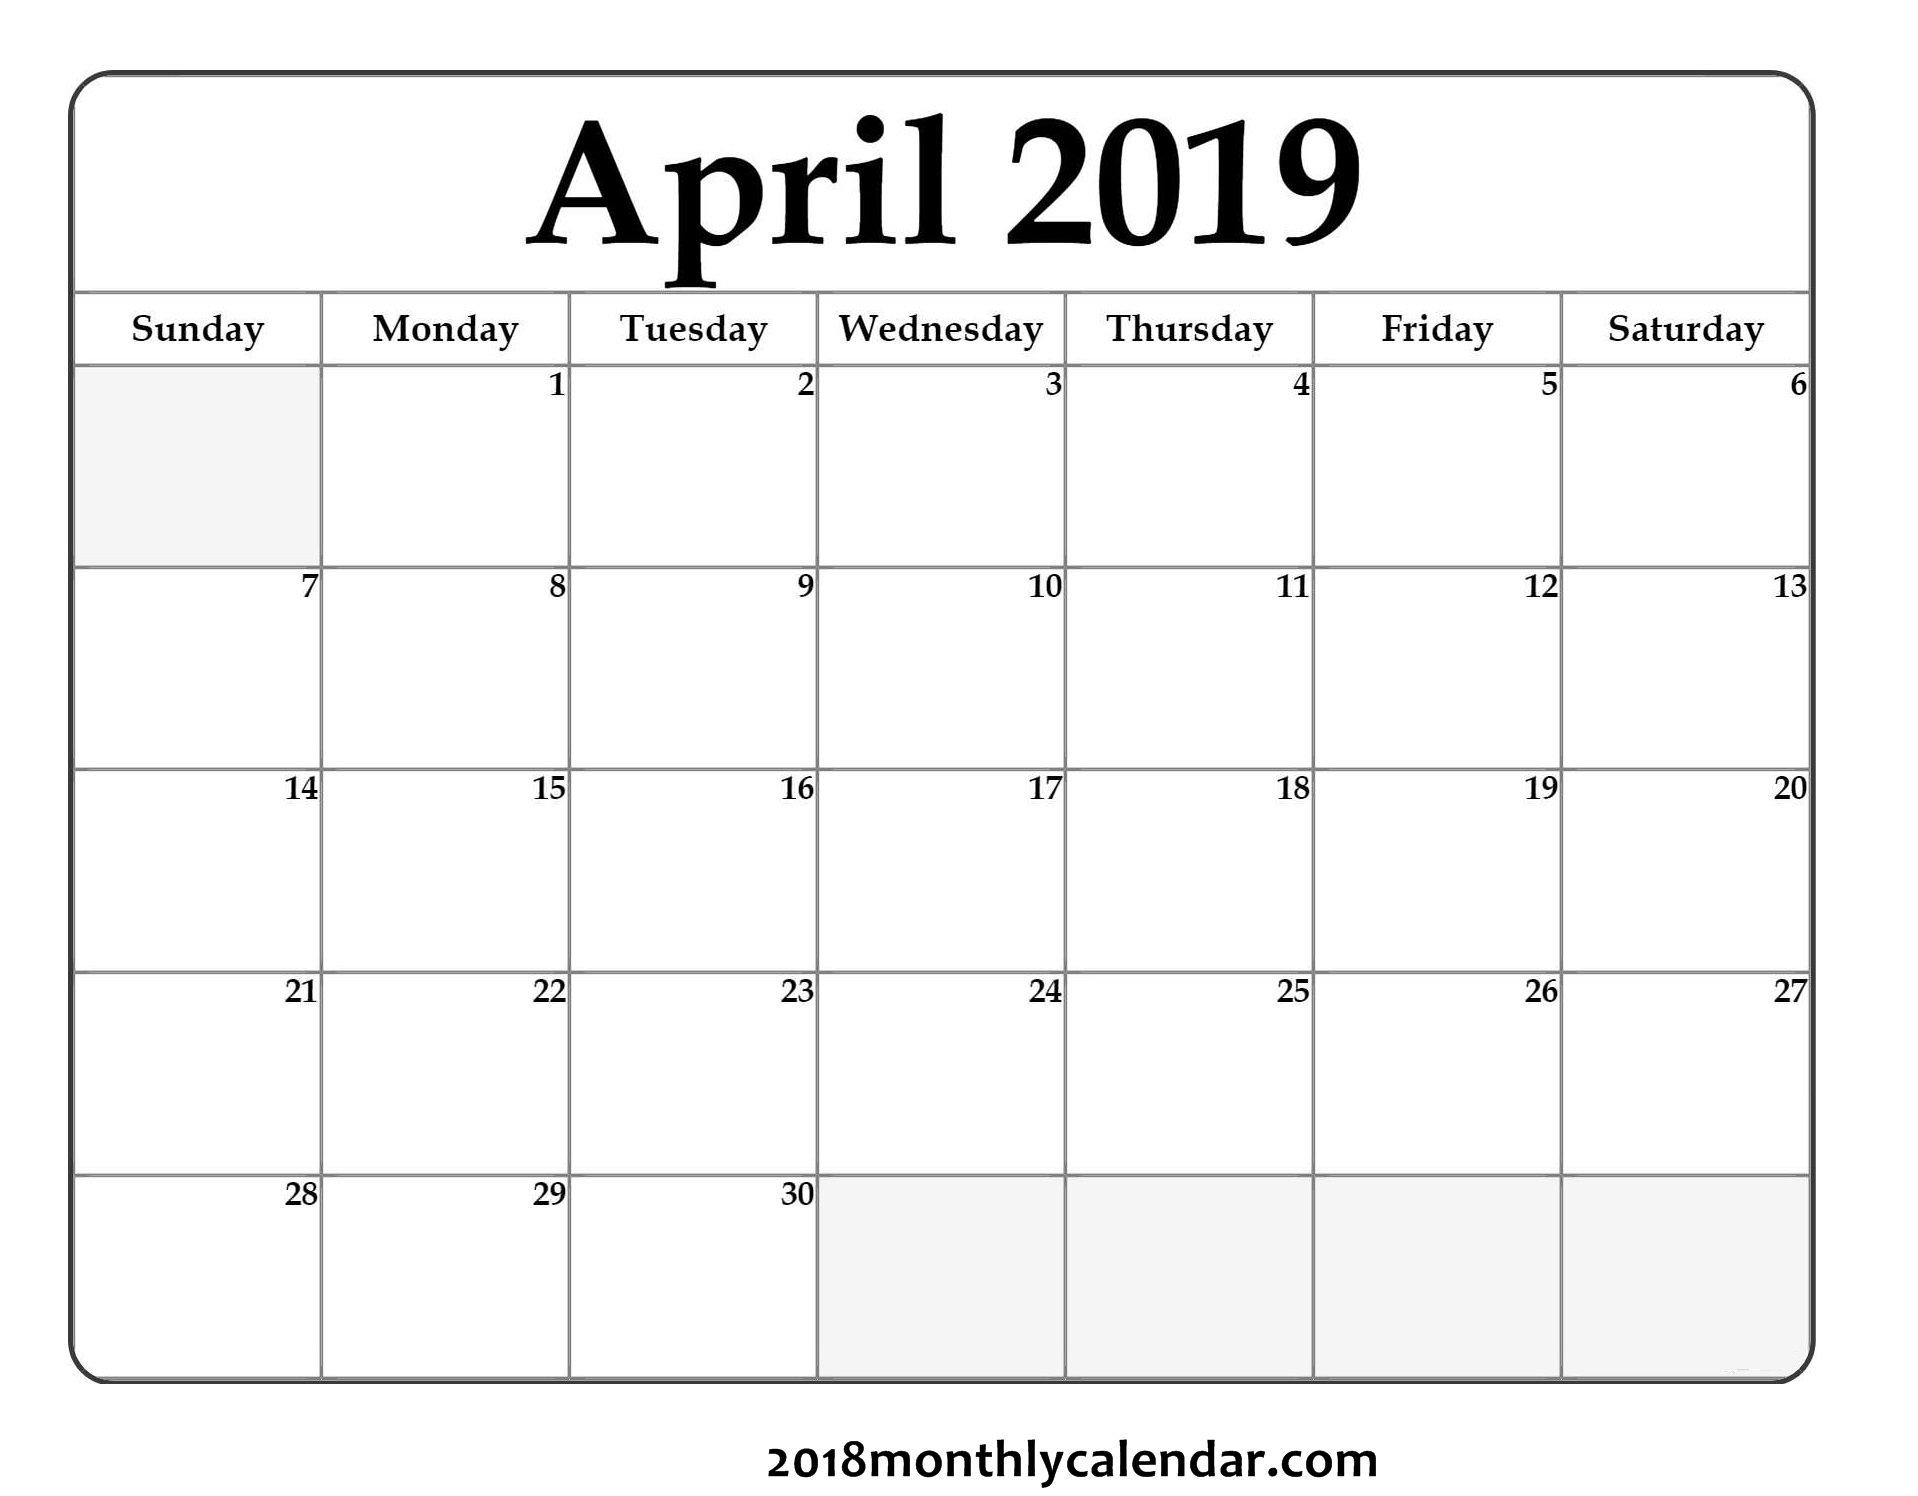 Download April 2019 – Printable Blank & Editable Calendar That I Can Edit